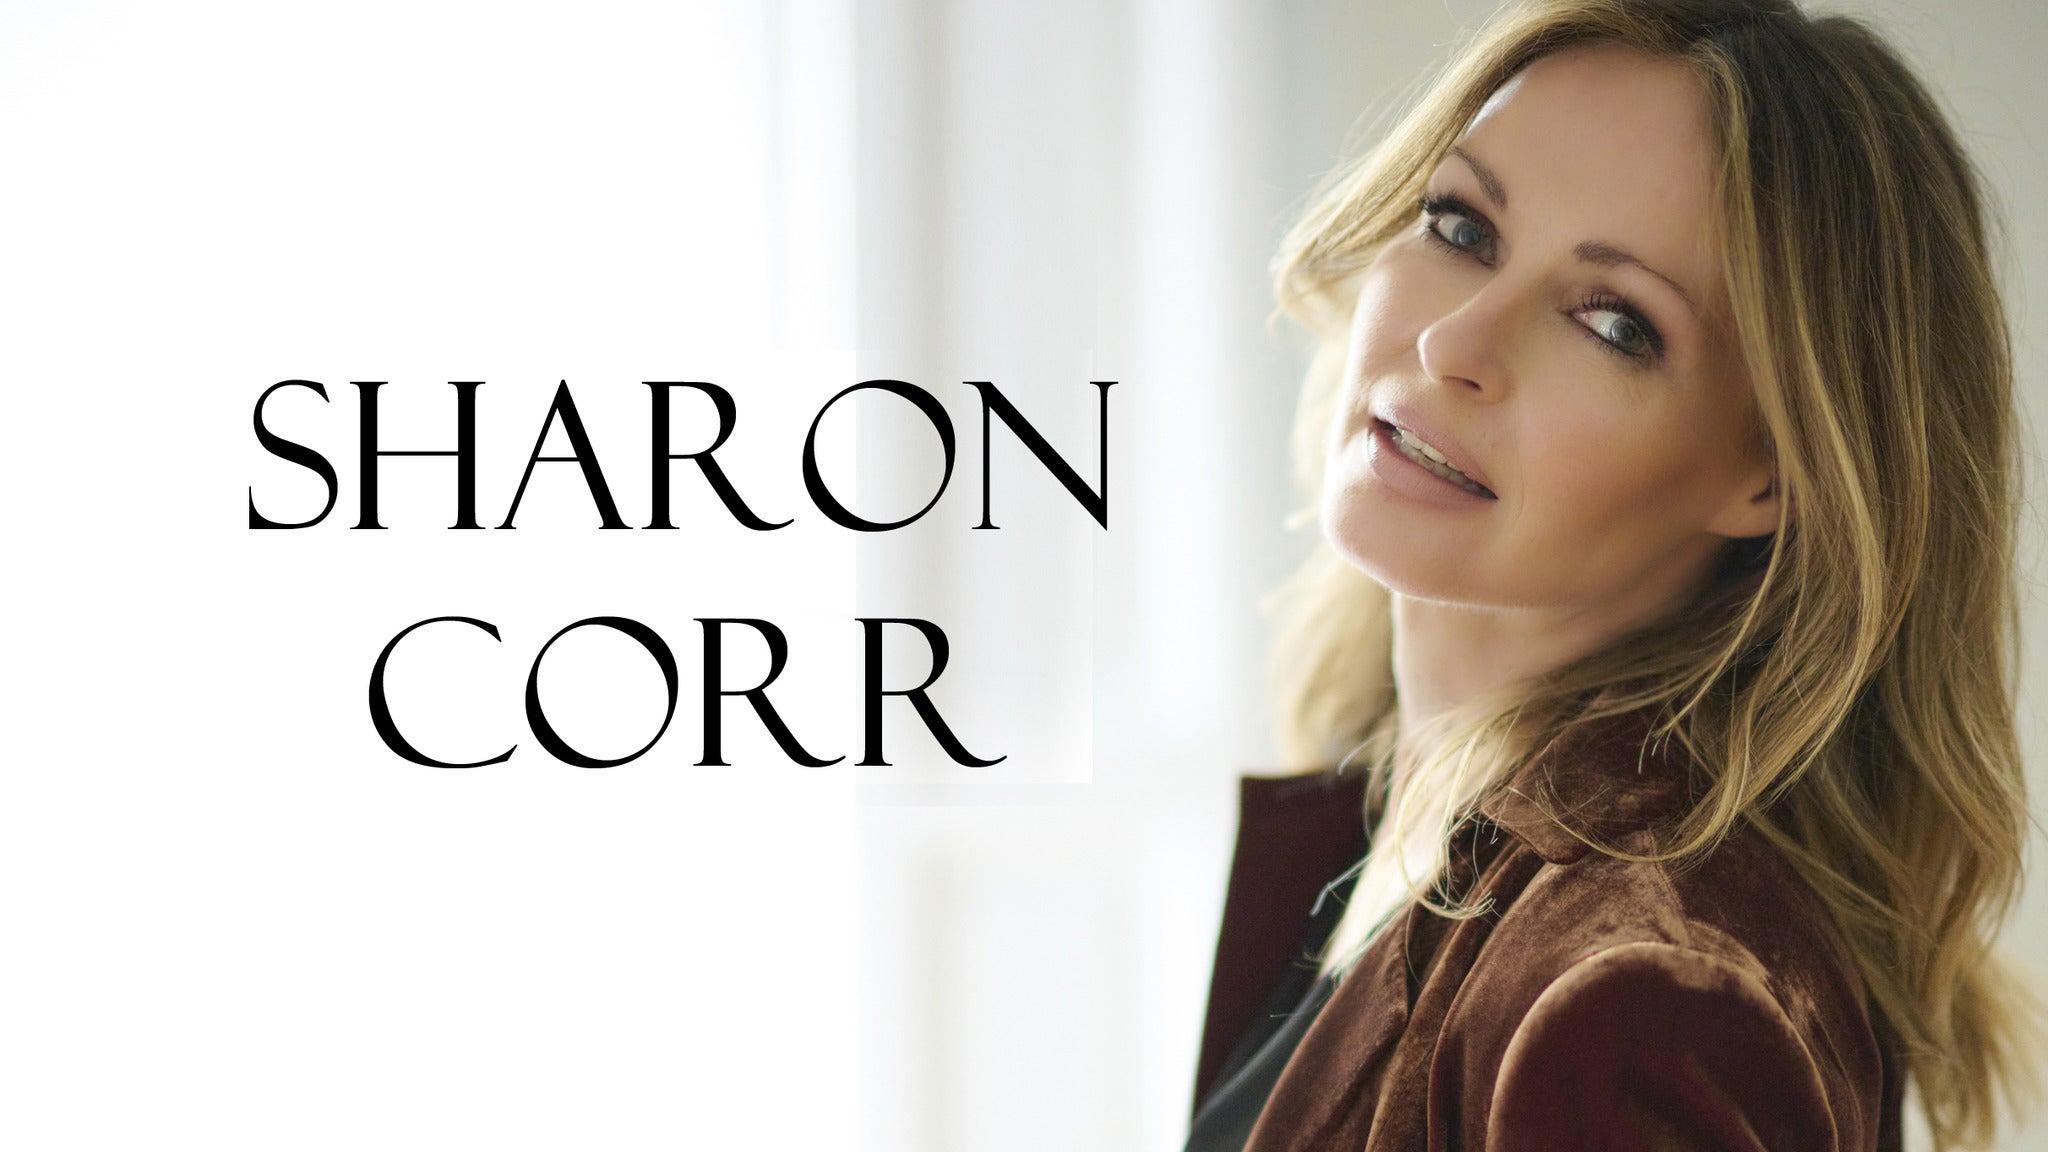 Sharon Corr